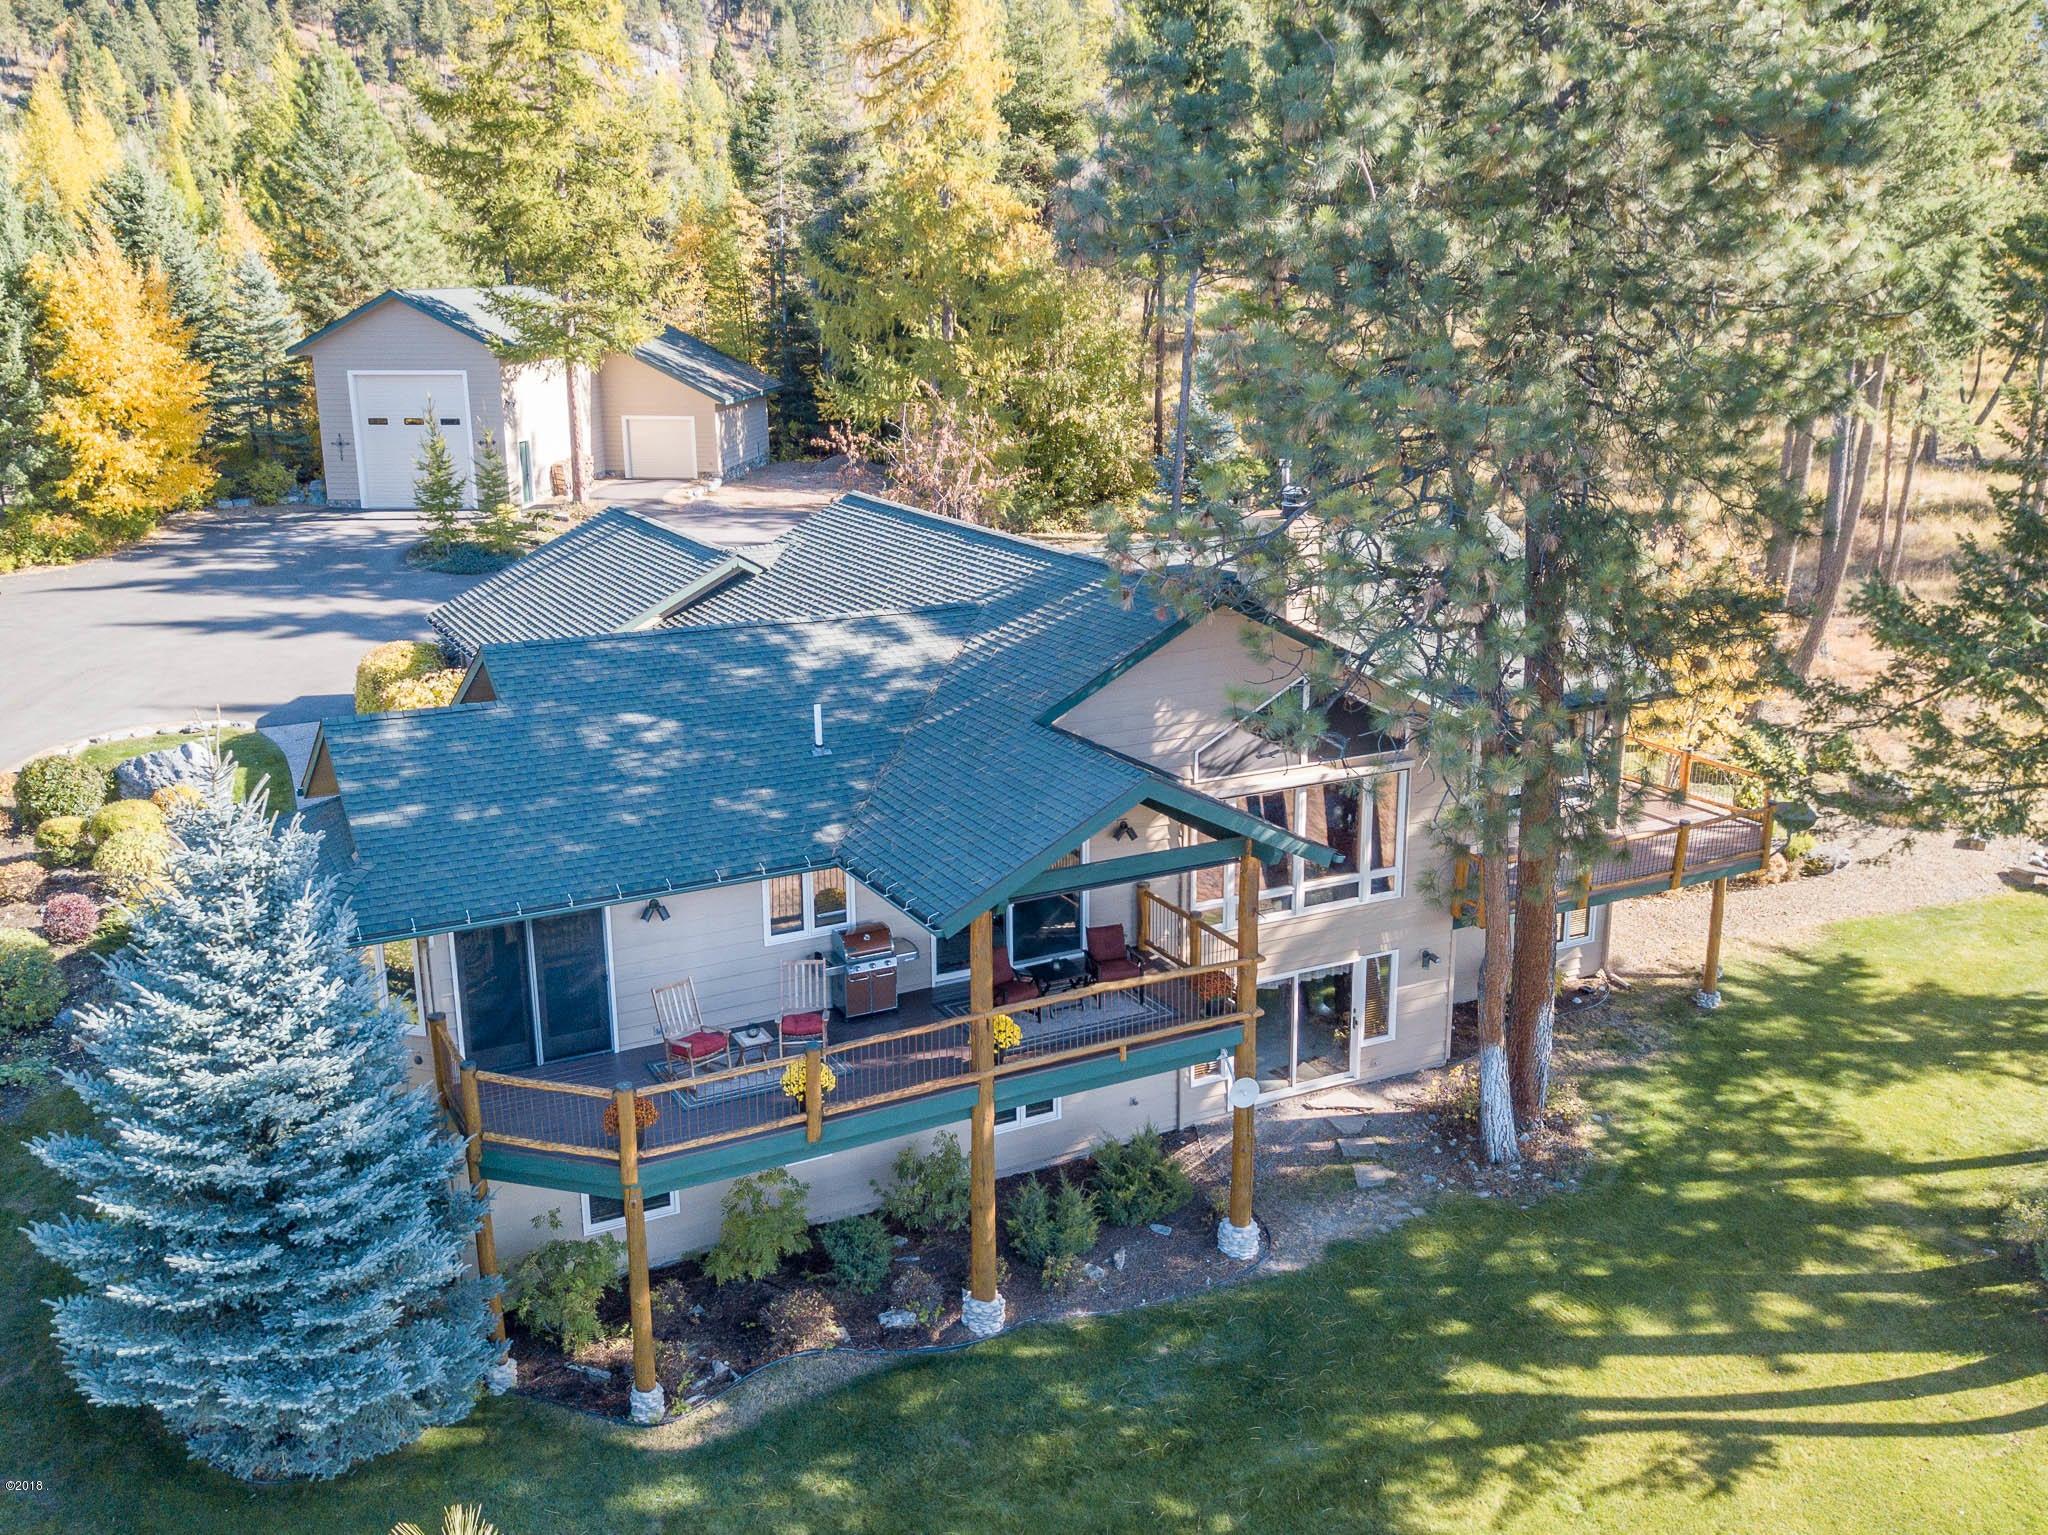 Single Family Home for Sale at 16713 Elkridge Road 16713 Elkridge Road Bigfork, Montana 59911 United States